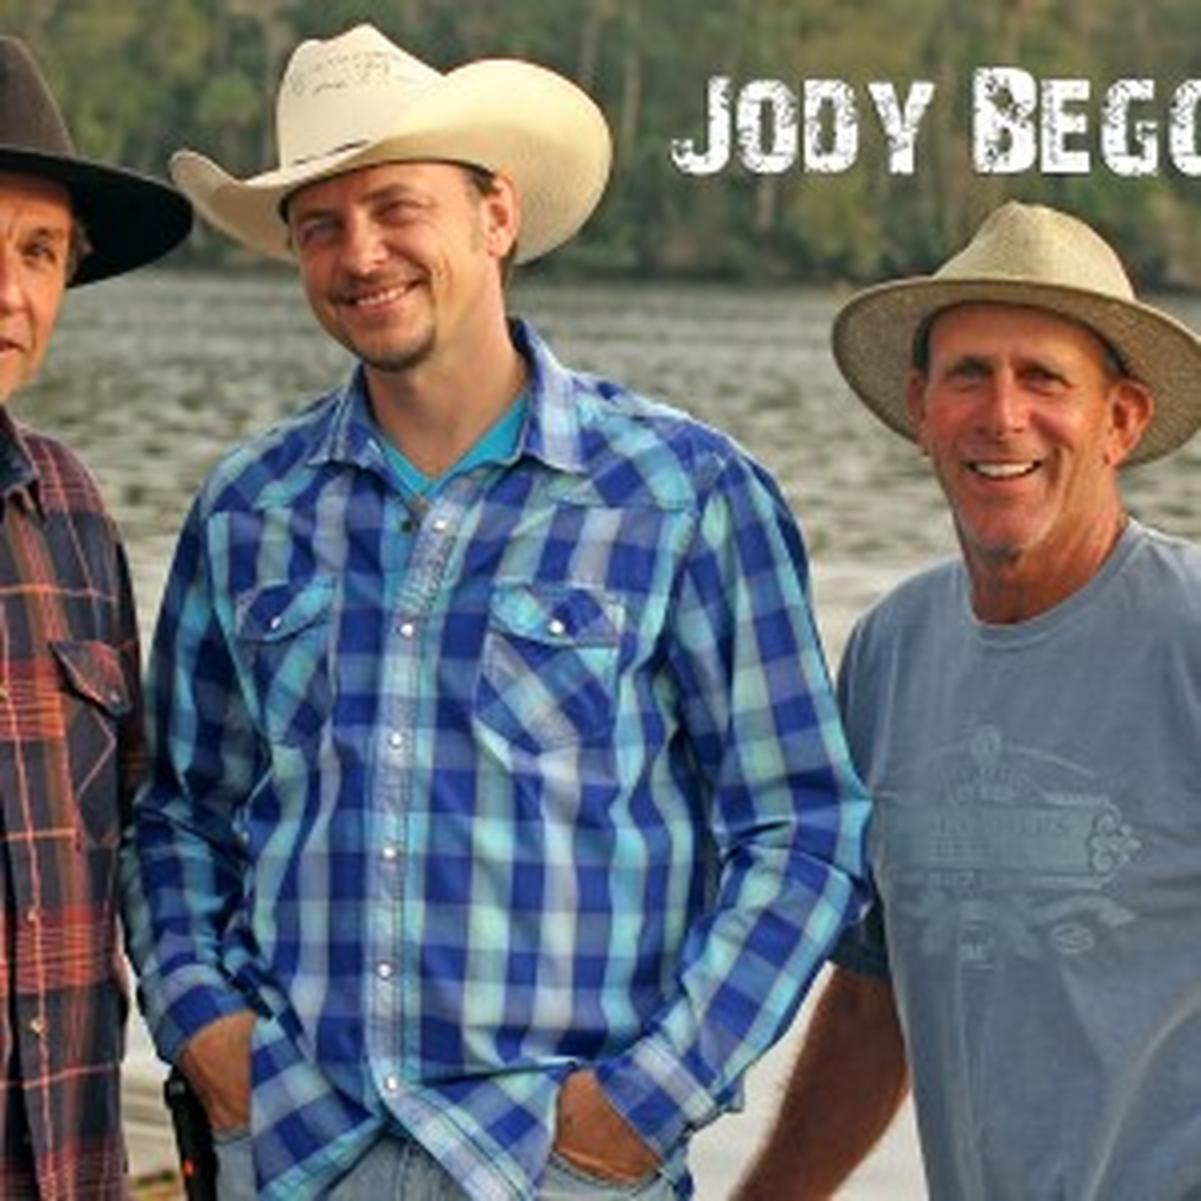 Jody Beggs Band wiki, Jody Beggs Band review, Jody Beggs Band history, Jody Beggs Band news